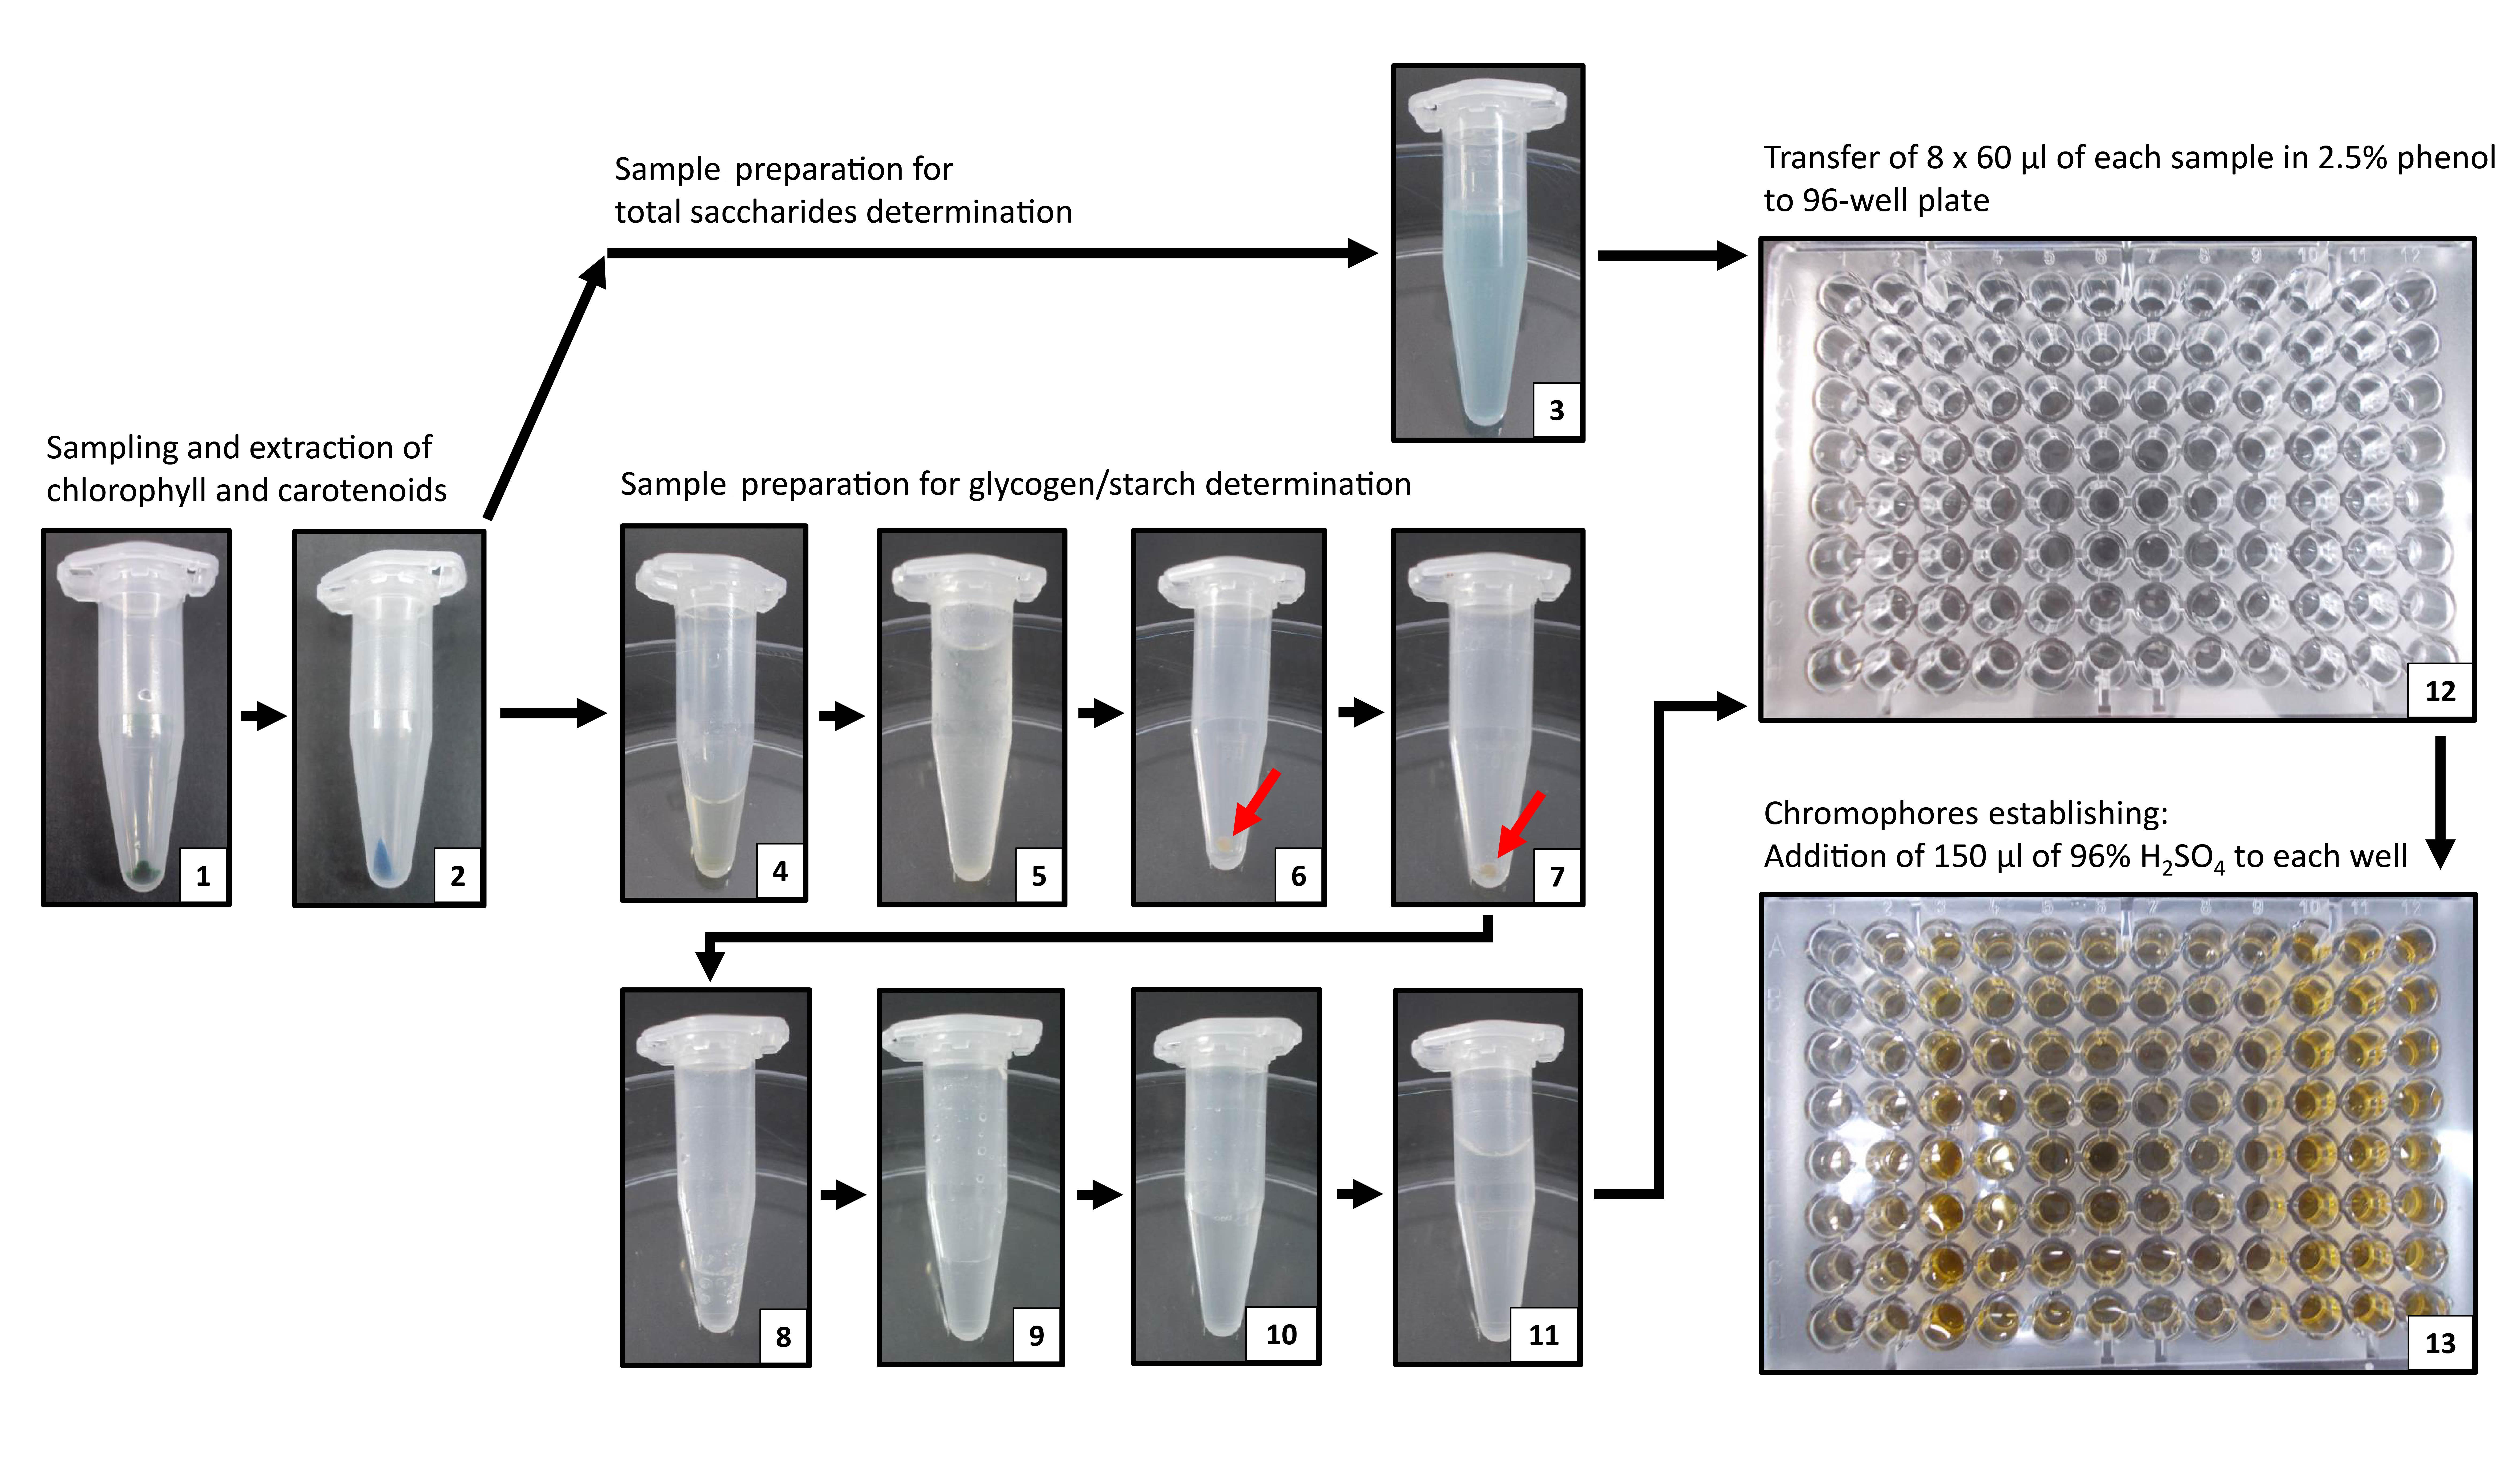 Determination of Storage (Starch/Glycogen) and Total